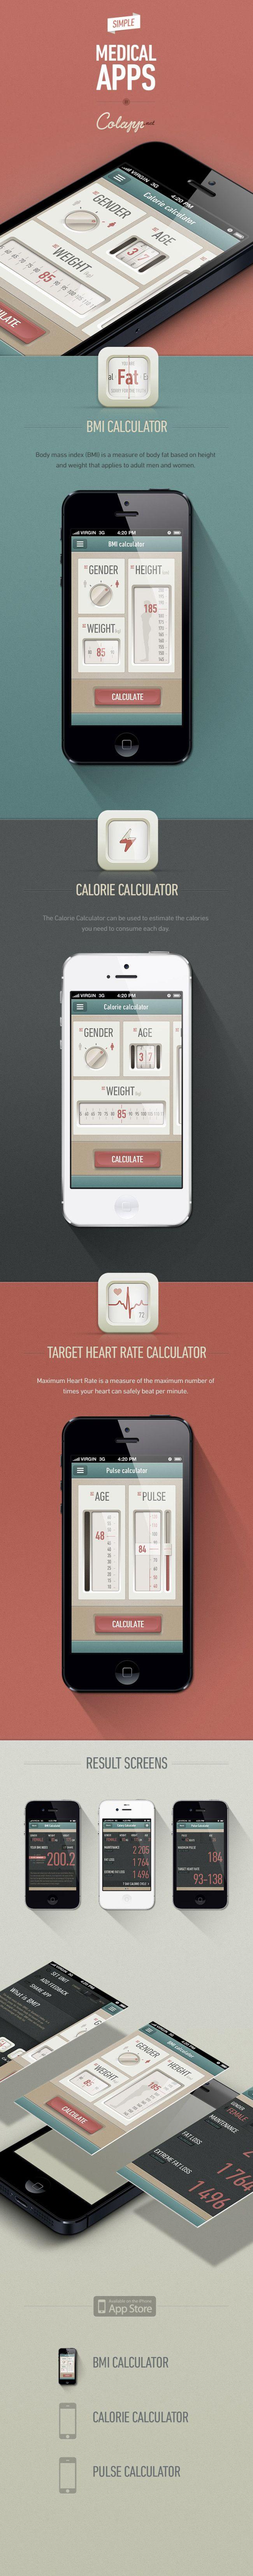 BMI App | web app ui design | MyDesy